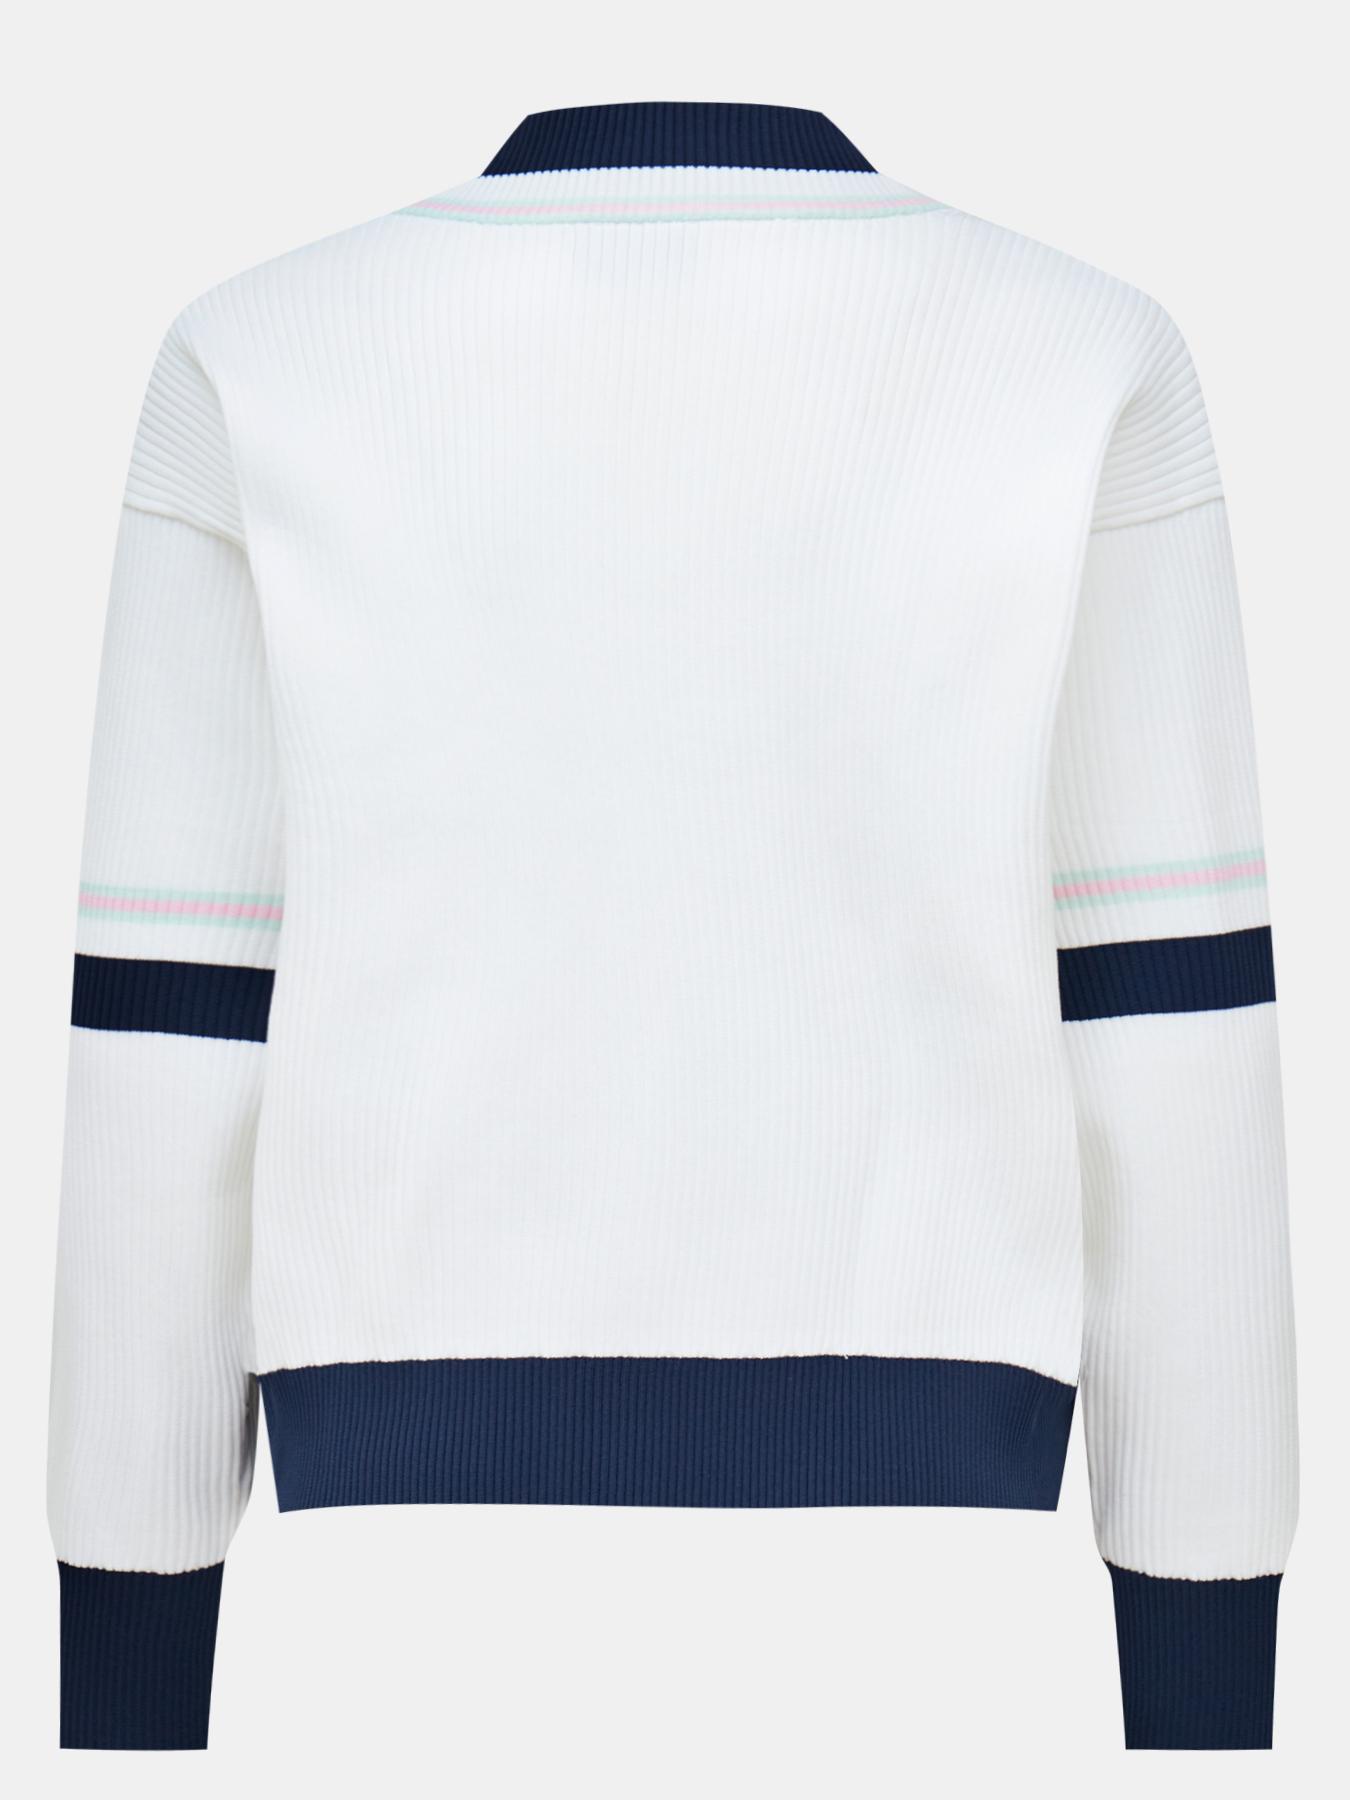 Свитер EA7 Emporio Armani Пуловер